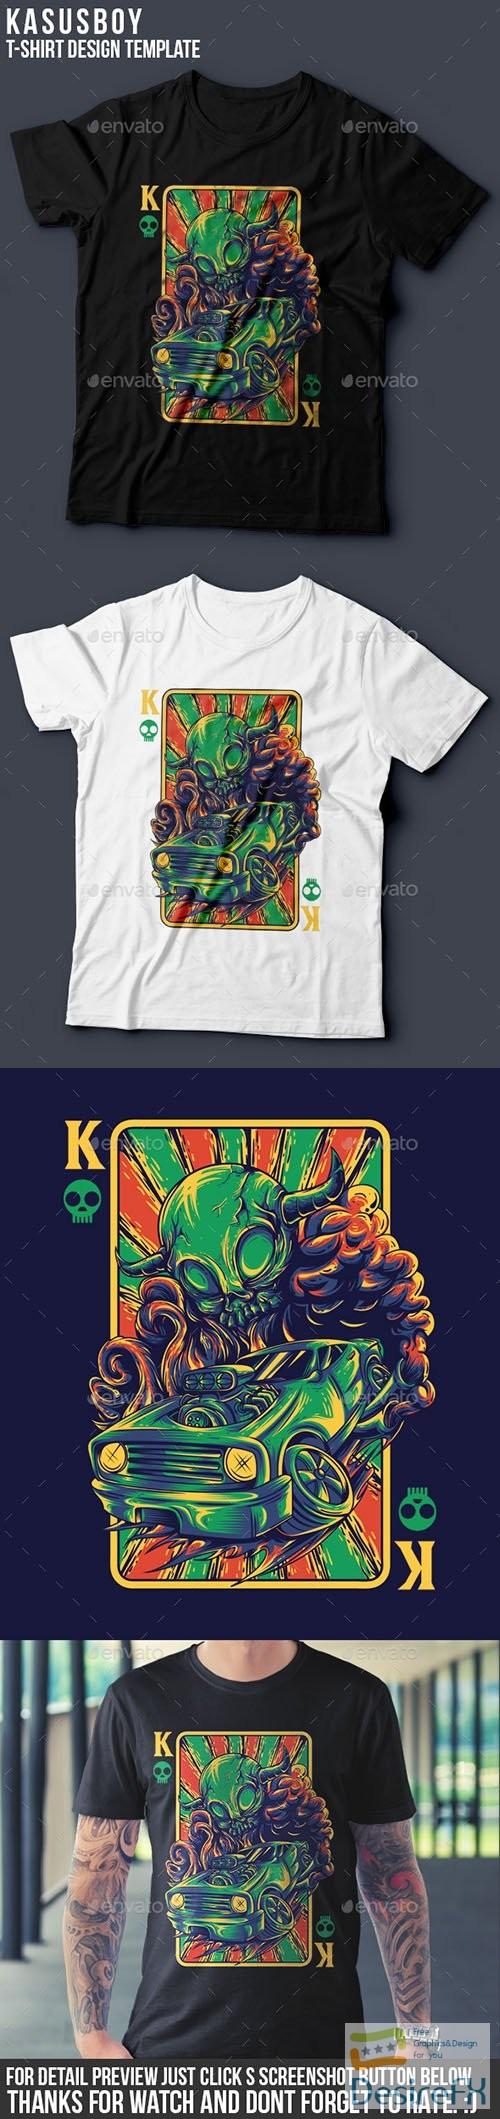 t-shirts-prints - Kasusboy! T-Shirt Design 13243236